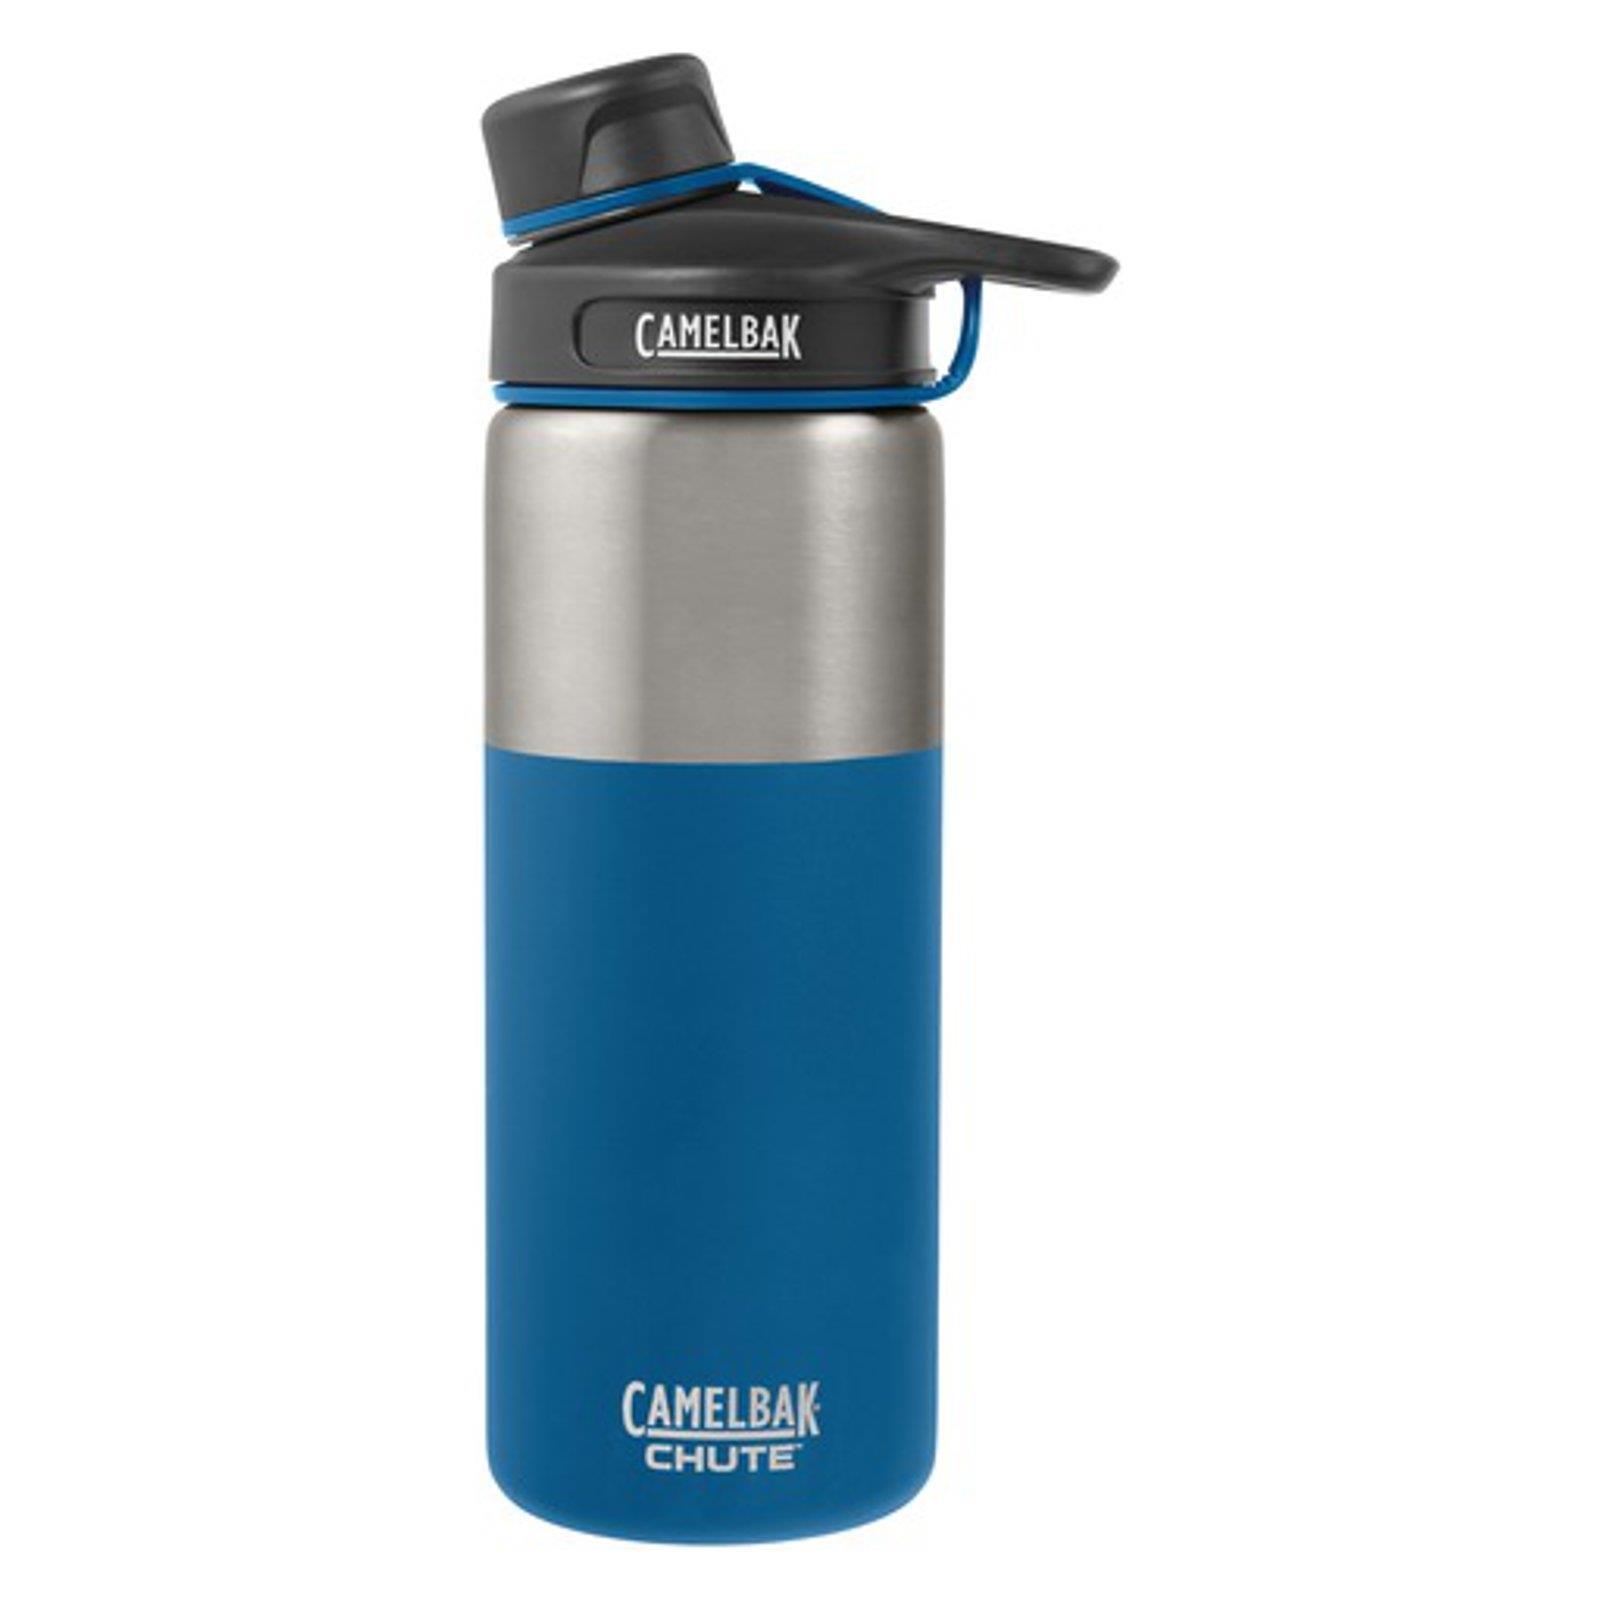 Camelbak-Trink-Isolier-Flasche-Chute-Vacuum-Thermo-Becher-Kanne-Outdoor Indexbild 14